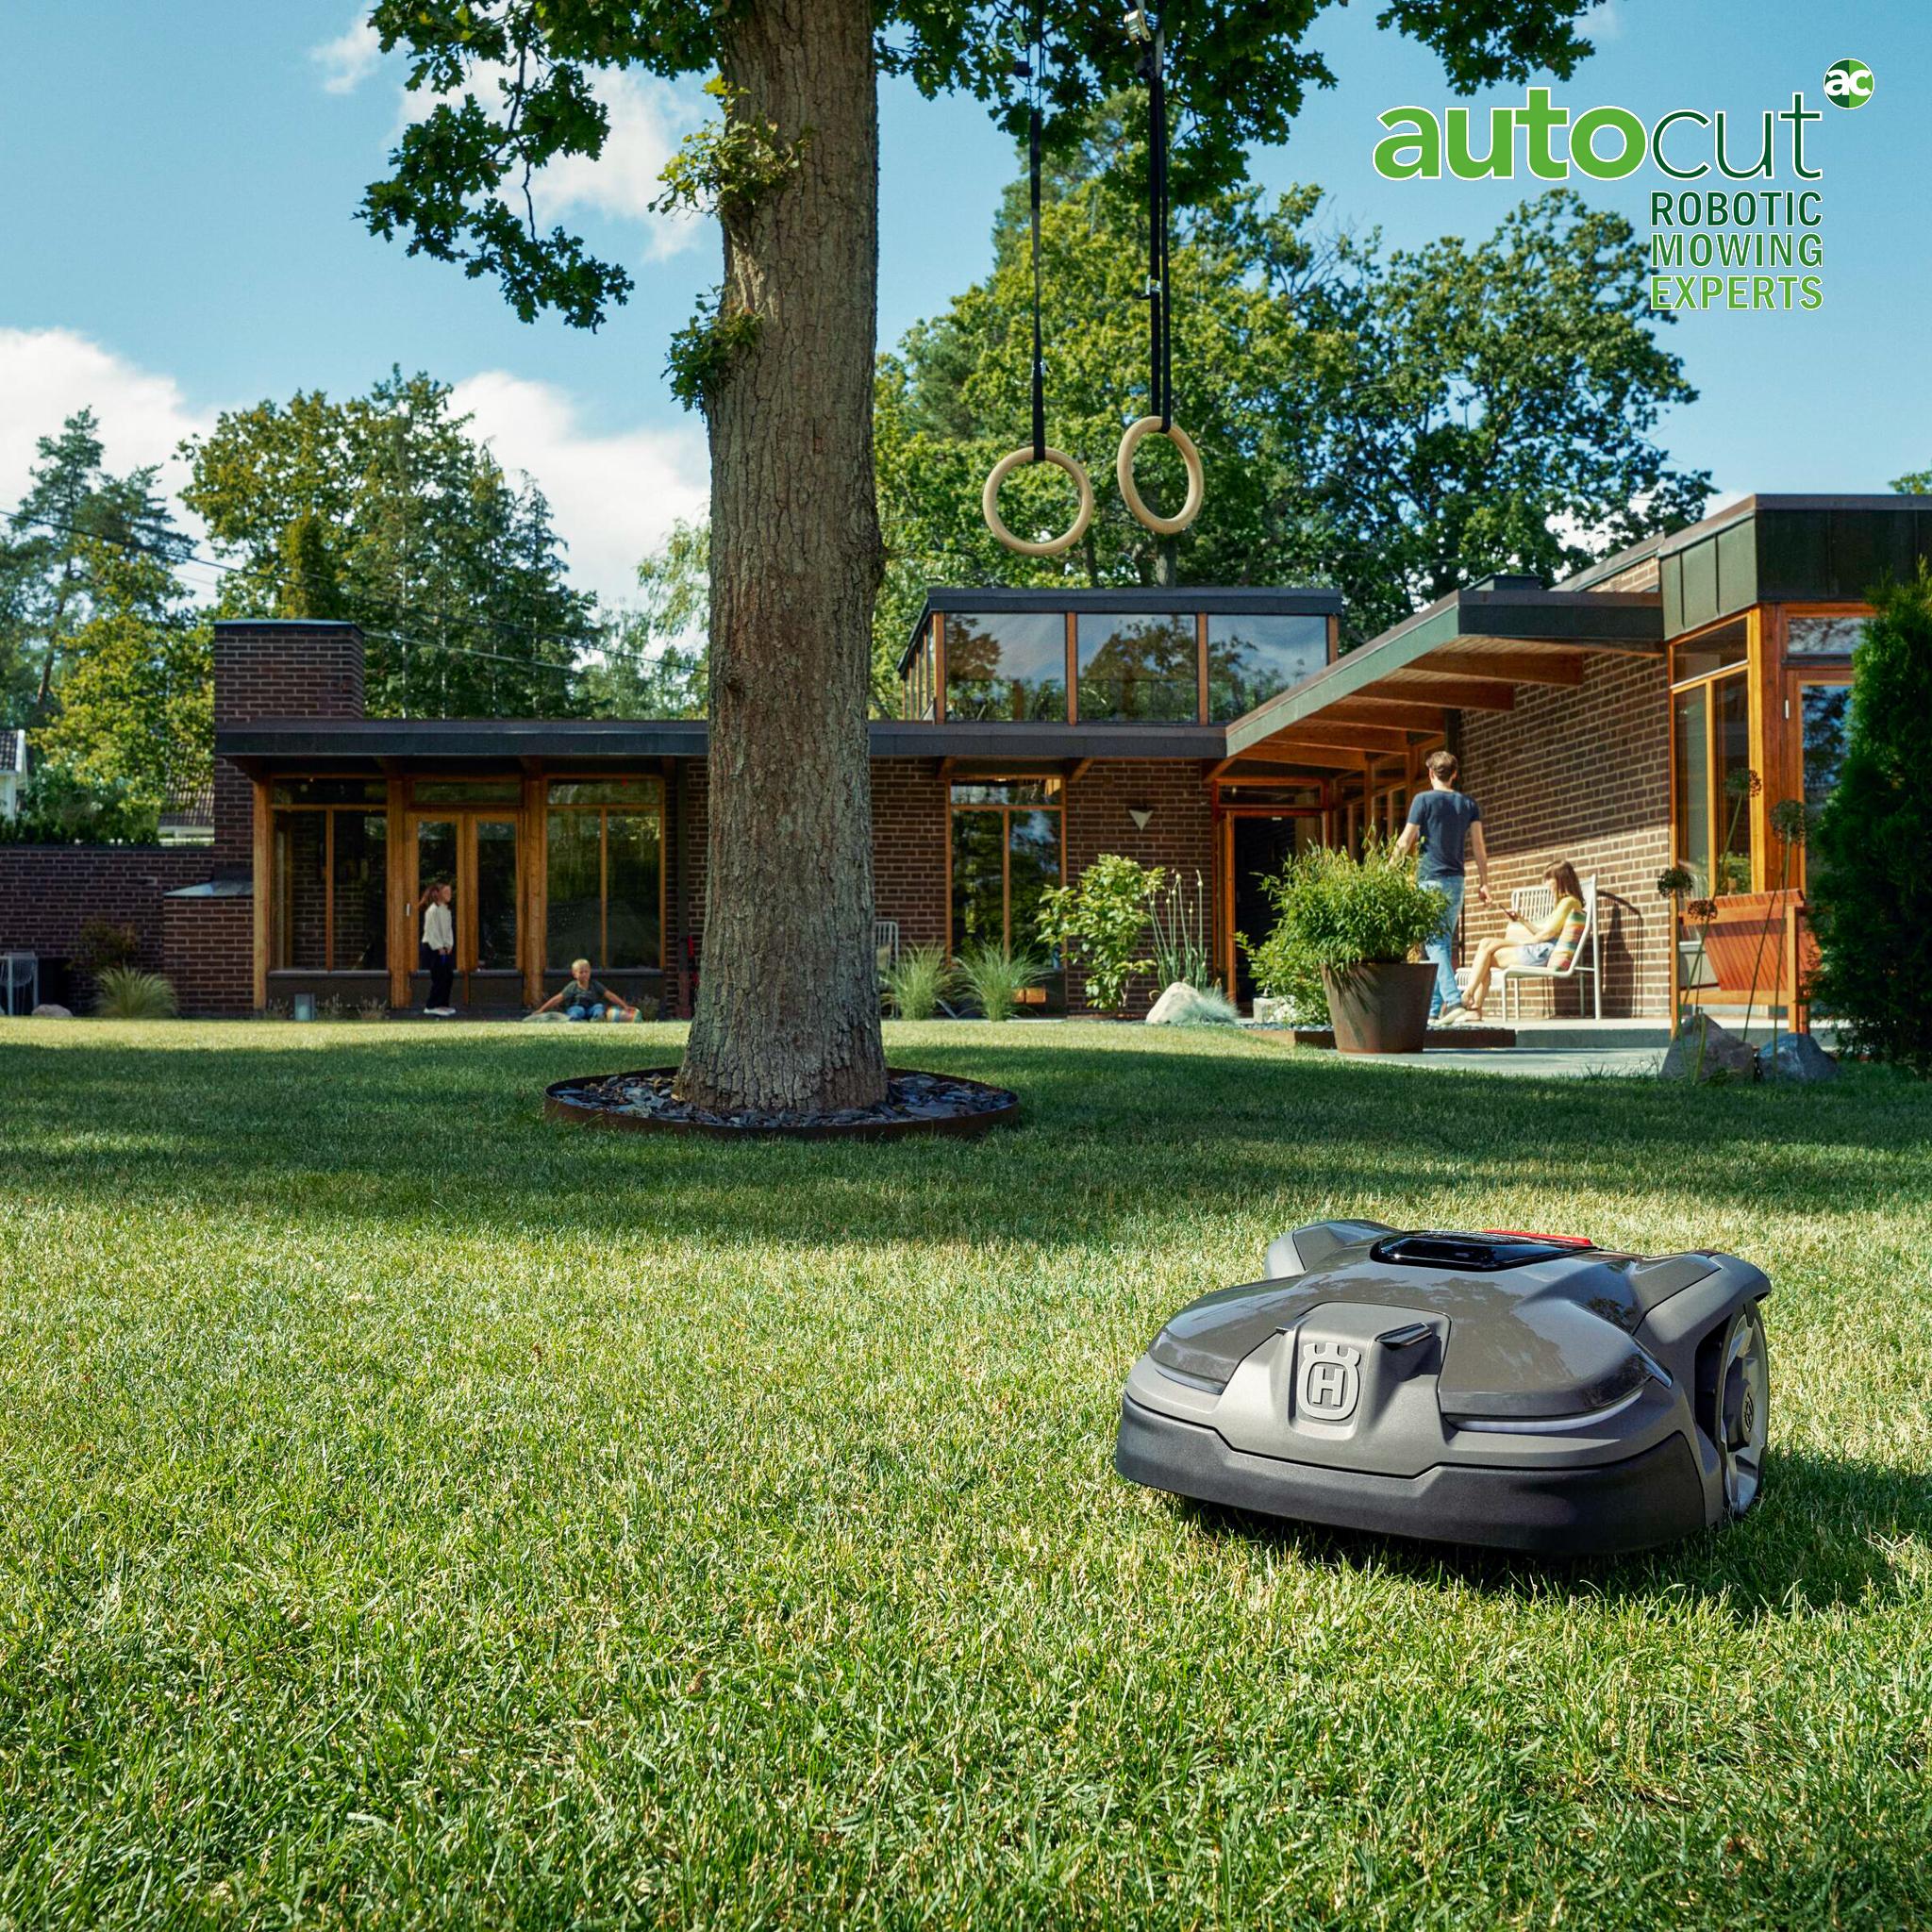 Meet the Mower: Automower® 415X